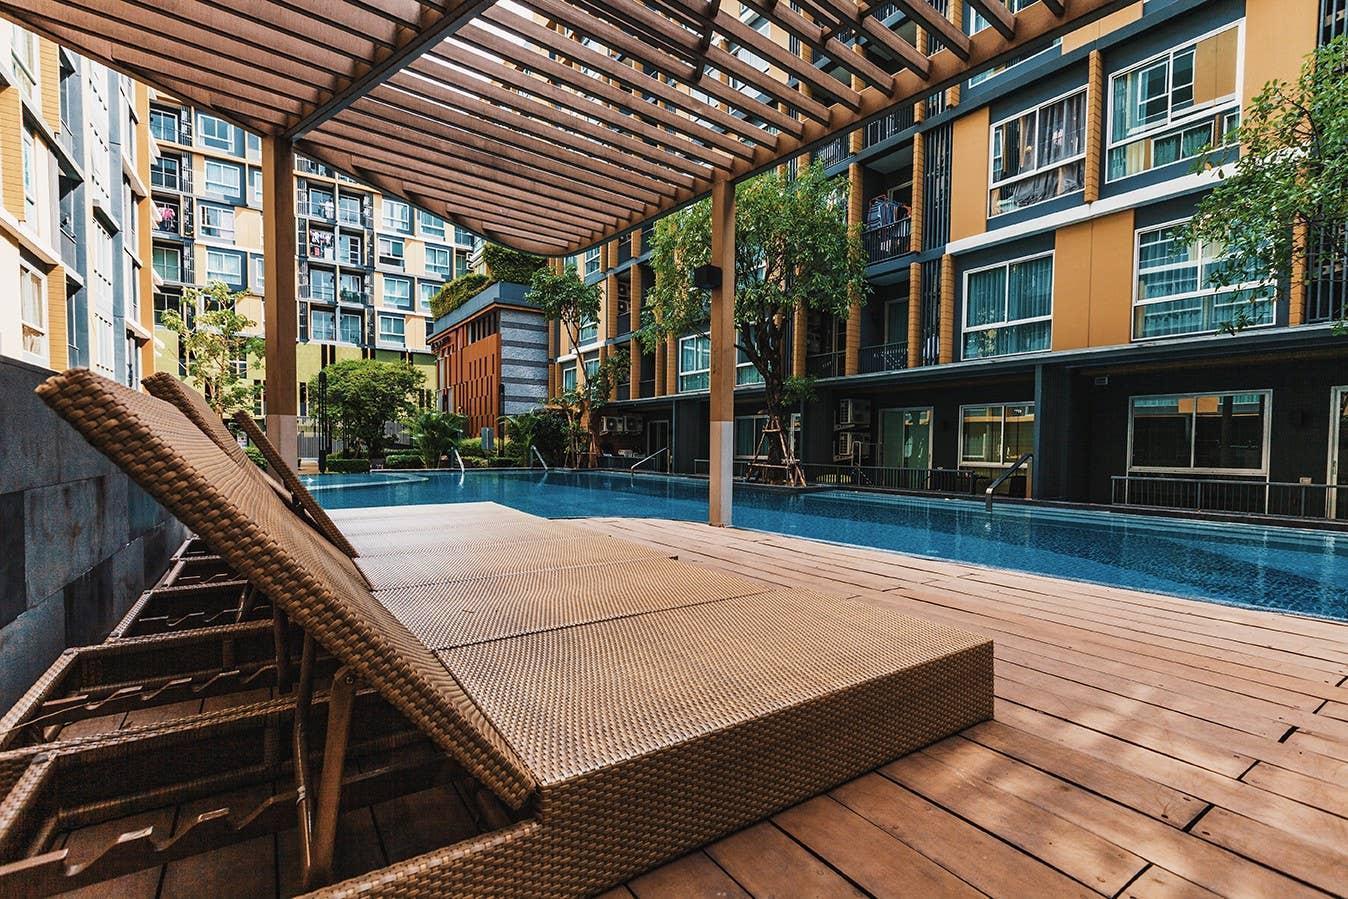 Modern style condo in Rama4 อพาร์ตเมนต์ 2 ห้องนอน 2 ห้องน้ำส่วนตัว ขนาด 60 ตร.ม. – สุขุมวิท